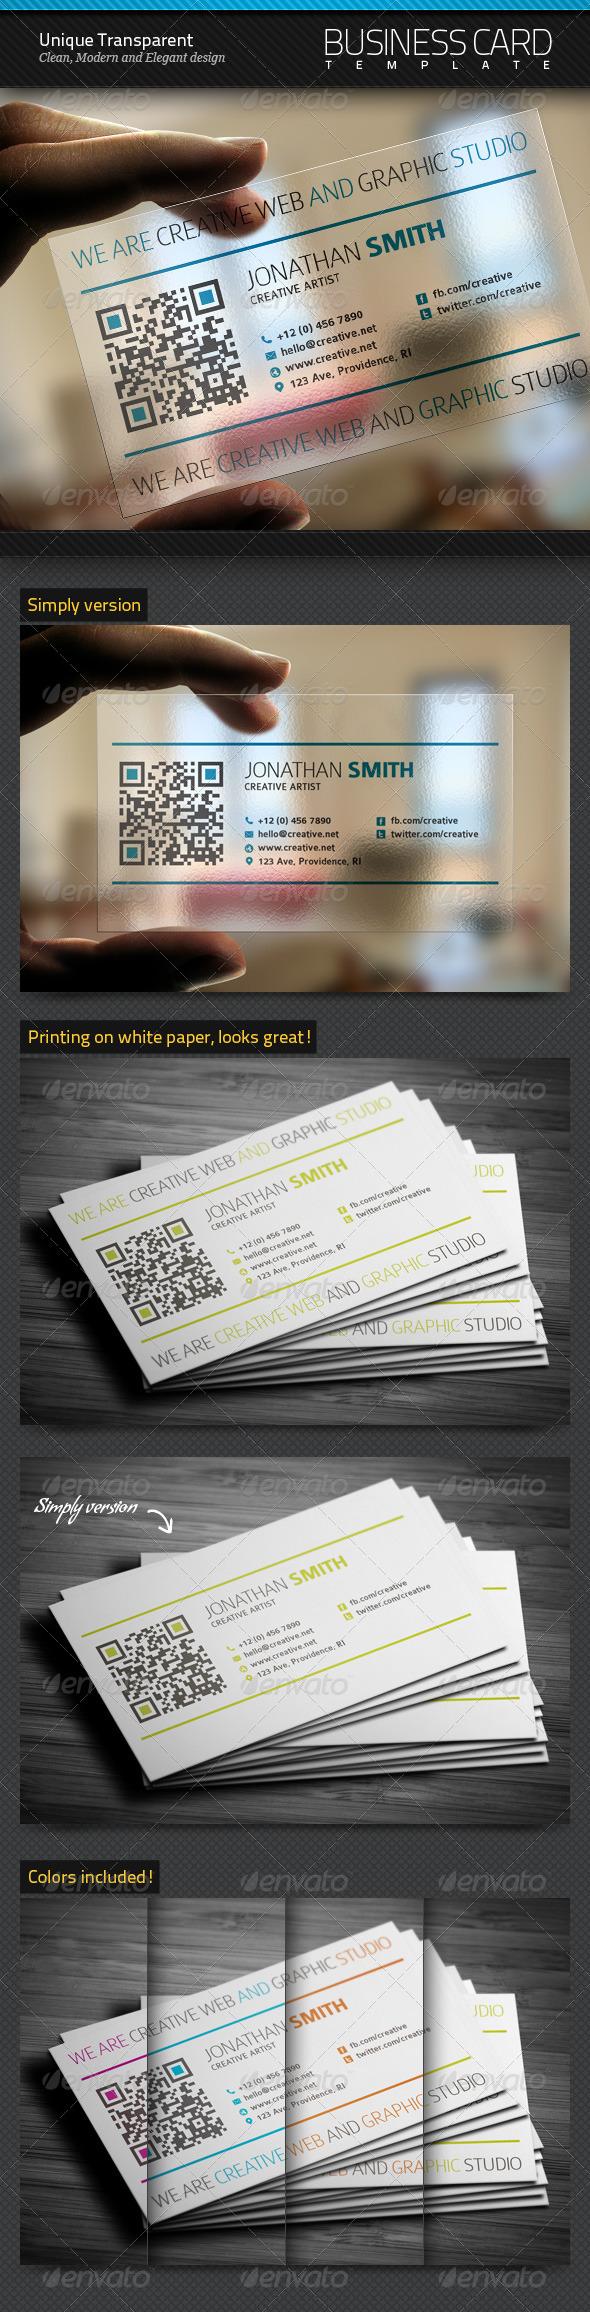 GraphicRiver Unique Transparent Business Card 5573112